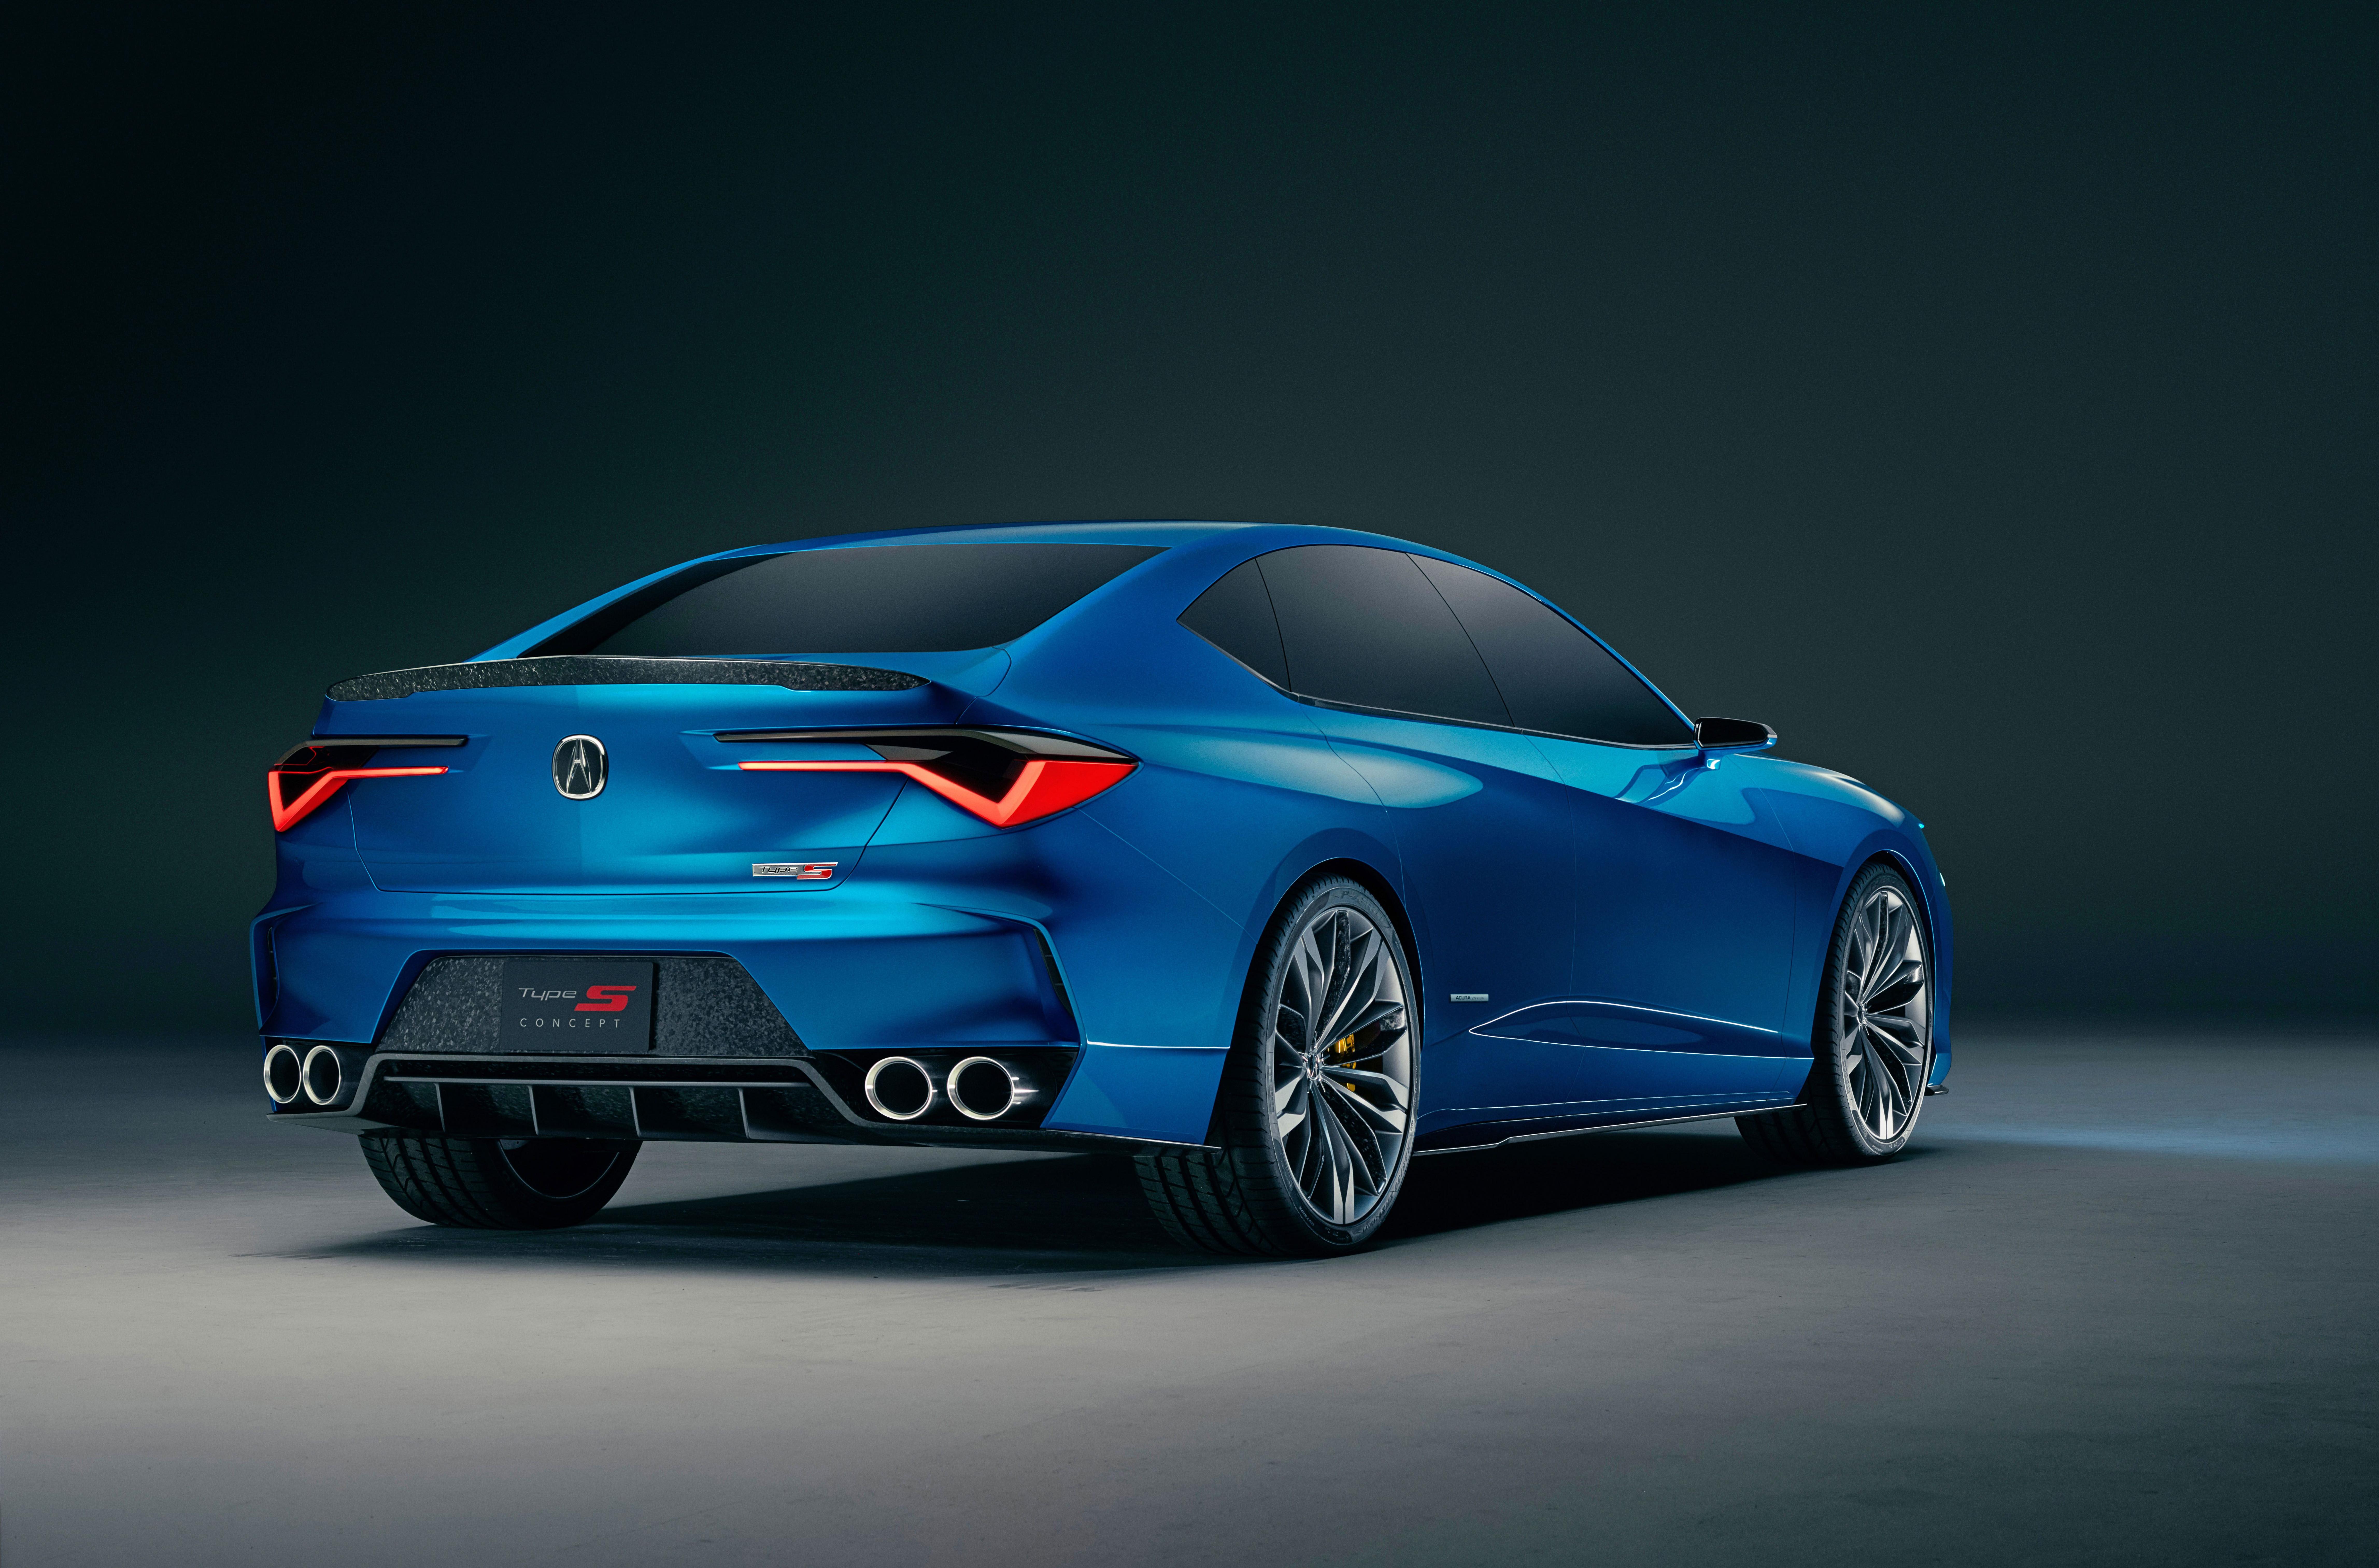 New Concept Acura Tlx 2022